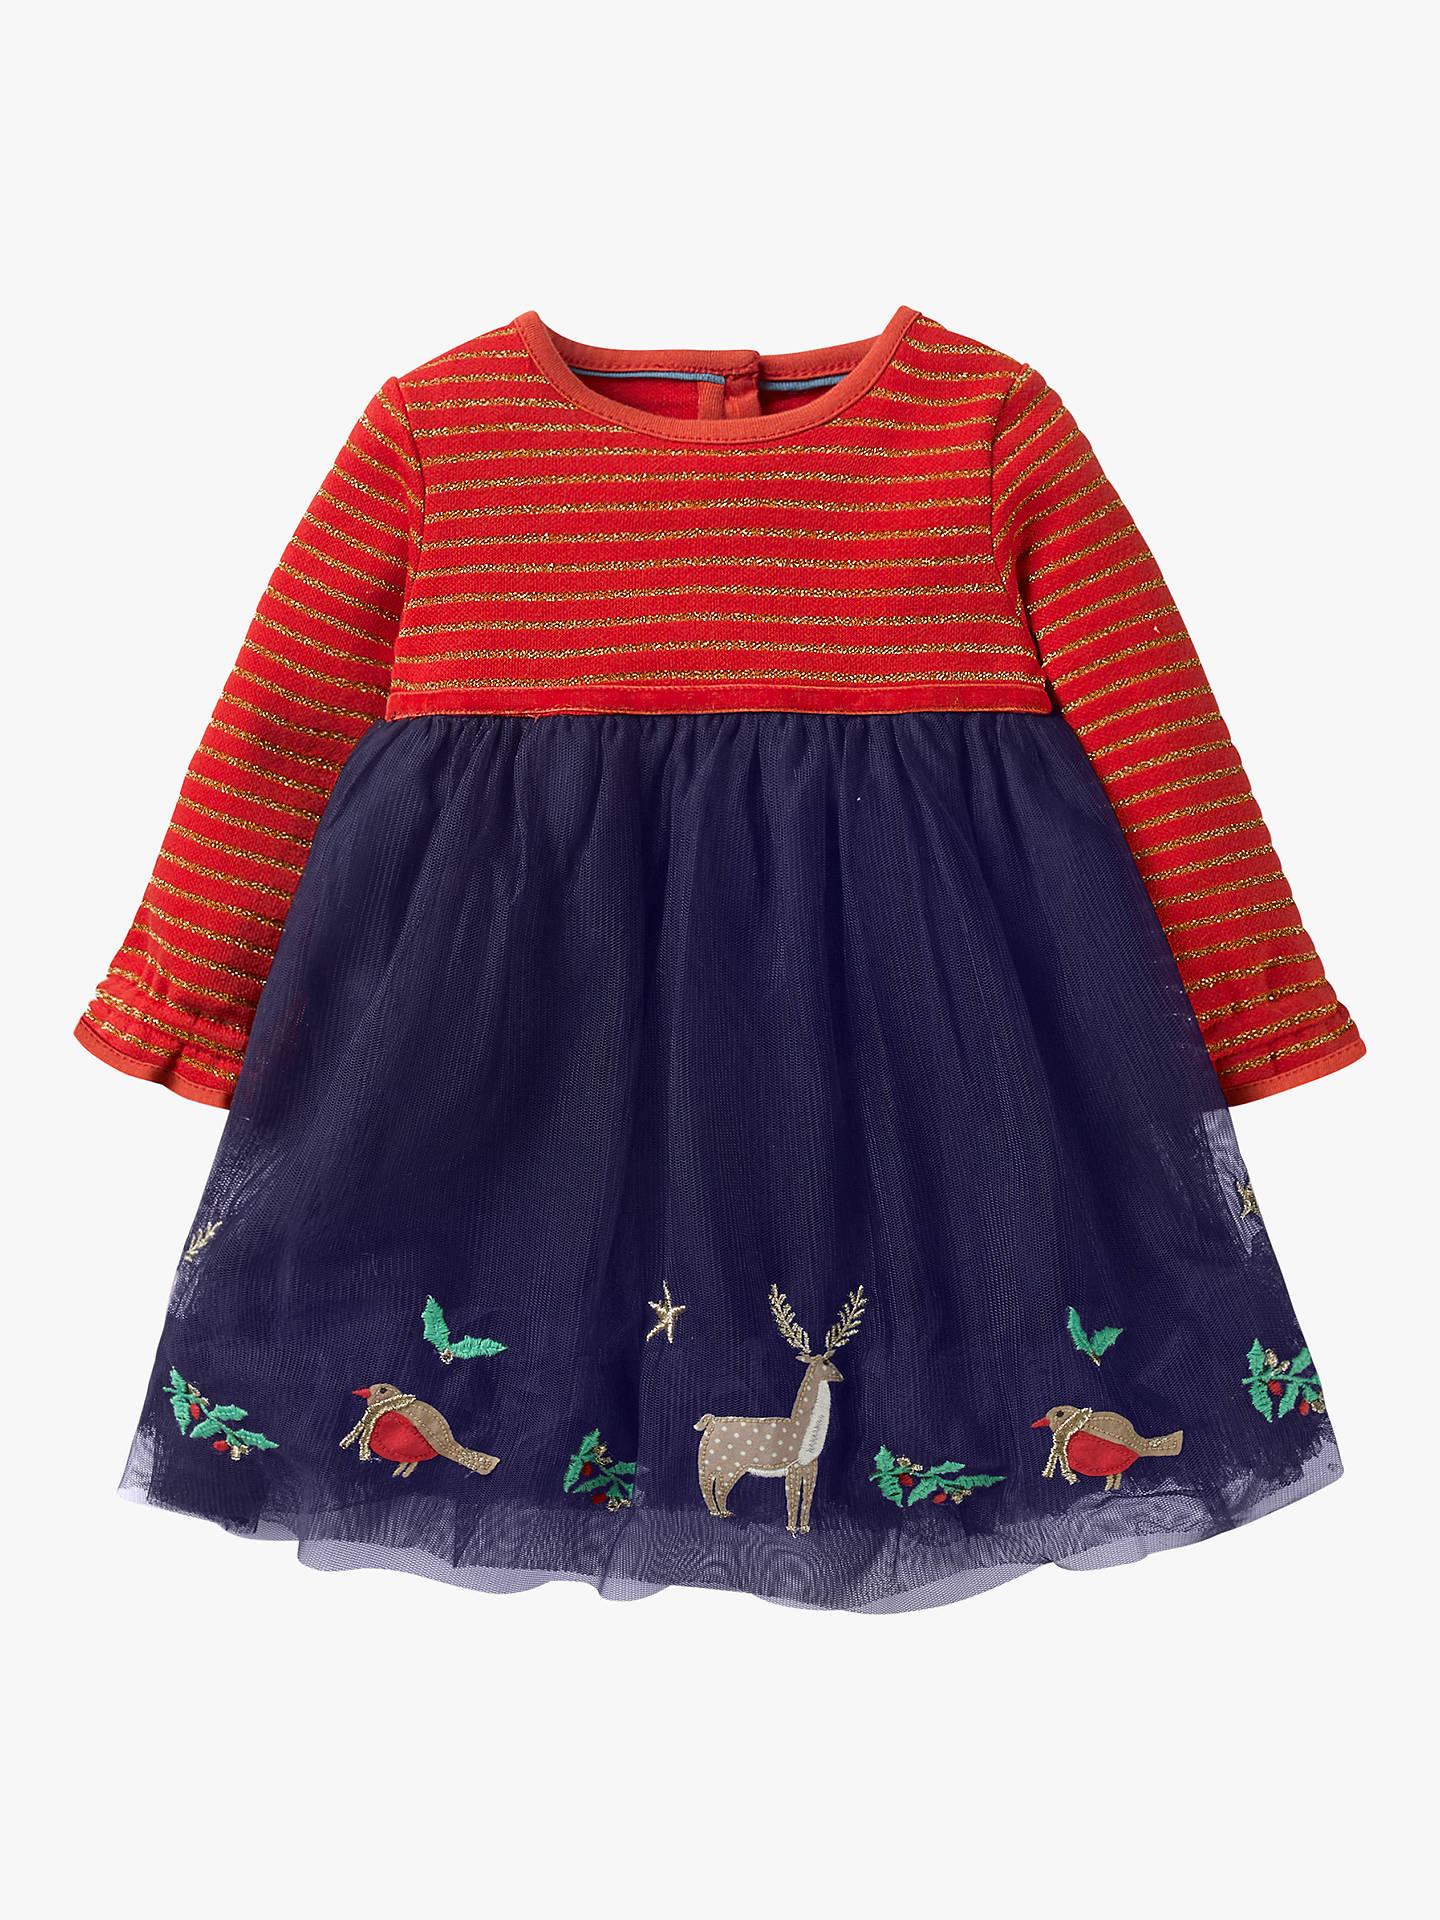 6edd8415cf1e Mini Boden Baby Magical Festive Tulle Dress